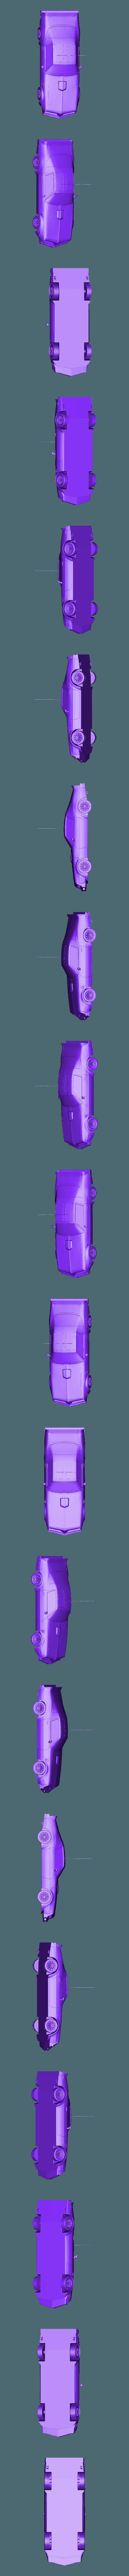 TransAm-1977.stl Download free STL file Trans-Am 1977 • 3D printing design, Double_Alfa_3D